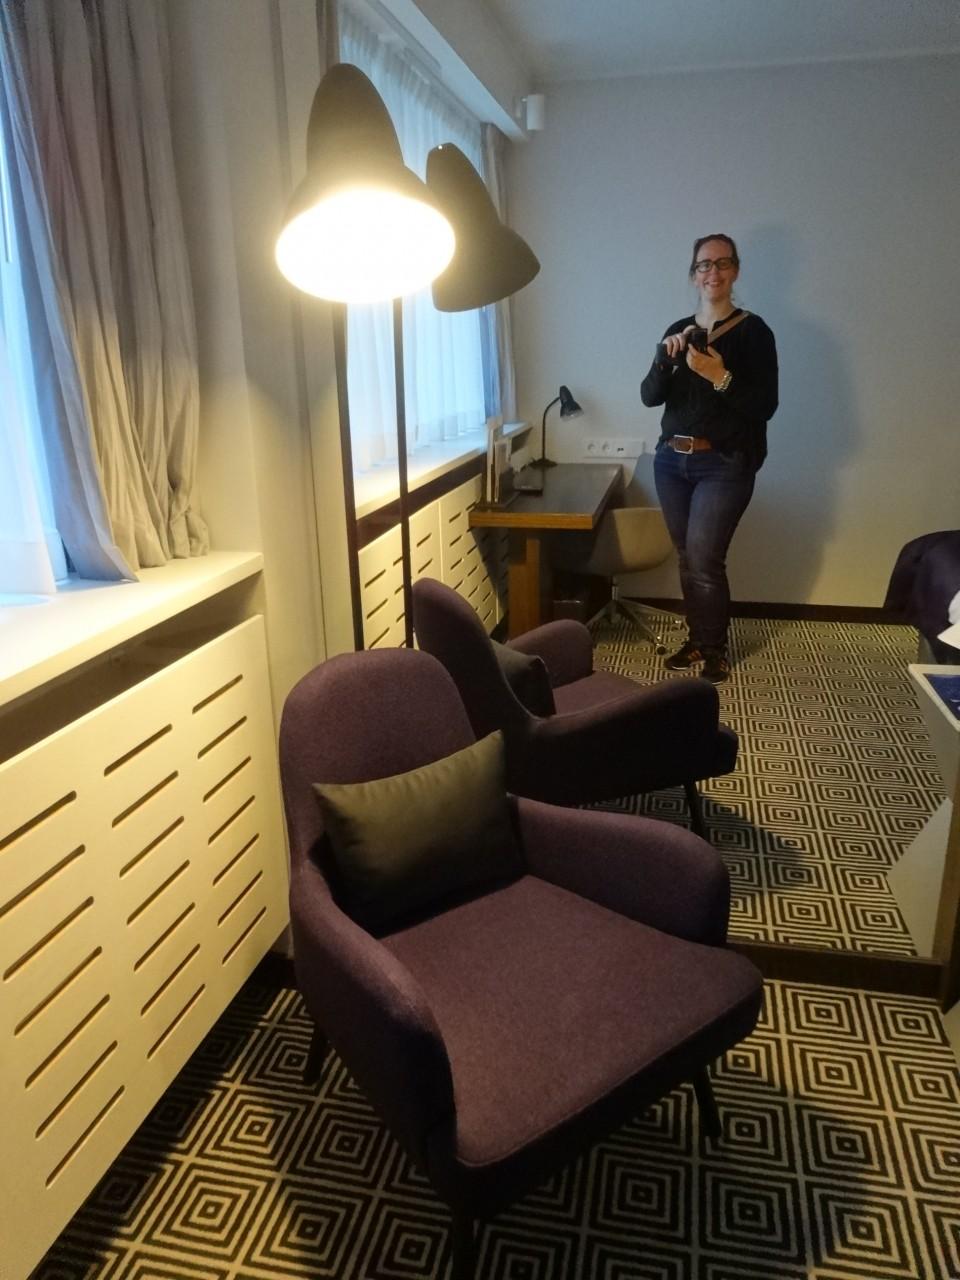 Radisson blu hotel lietuva vilnius insideflyer nl - Geloof spiegel keuken ...